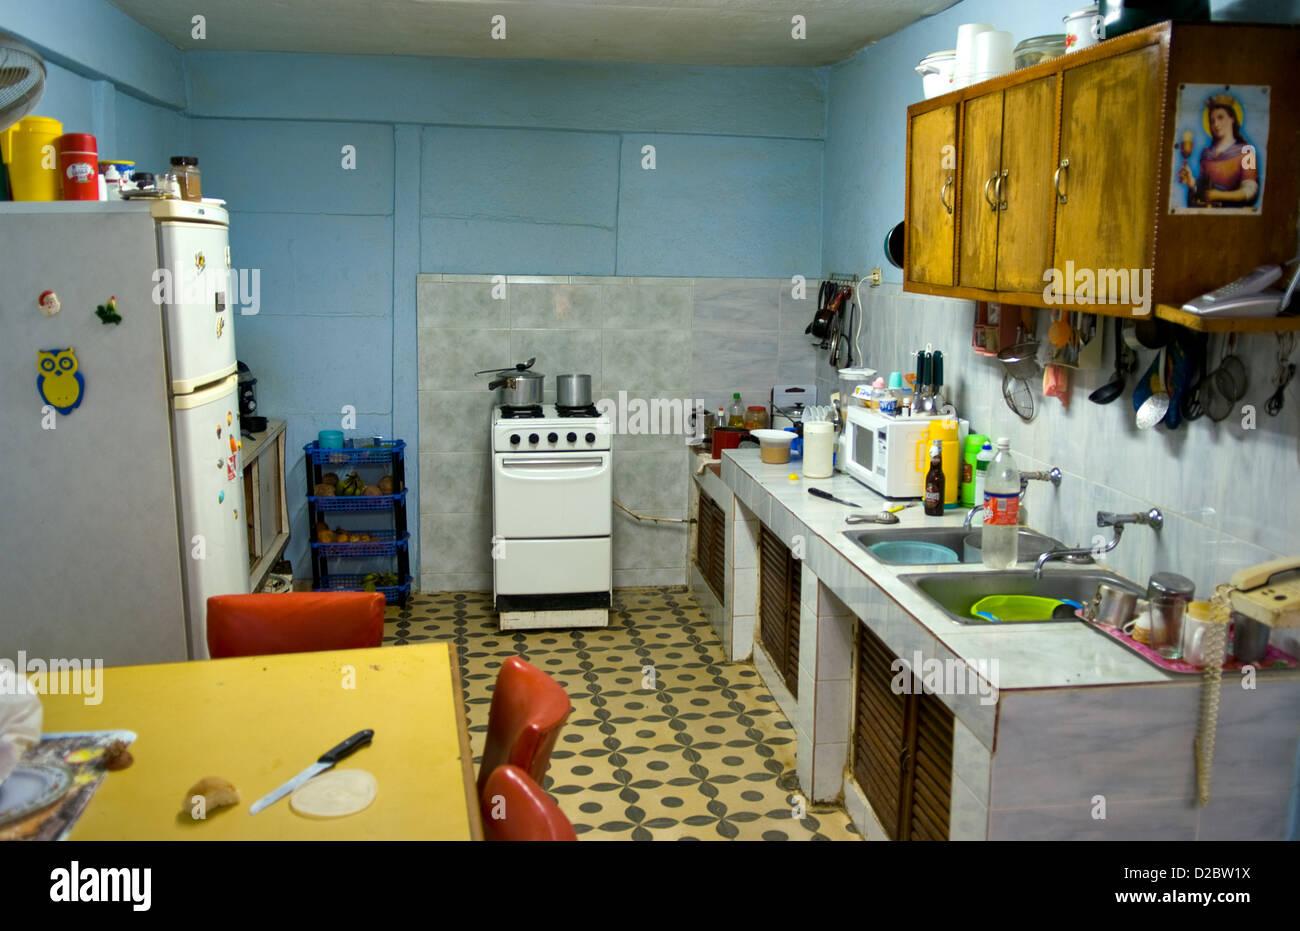 Kitchen Design In Trinidad on landscaping in trinidad, office furniture in trinidad, modern houses in trinidad, kitchen islands in trinidad, places in trinidad, kitchen cabinets in trinidad, architecture in trinidad, tiles in trinidad, life in trinidad, granite countertops in trinidad, best restaurants in trinidad, kitchen designs dubai, slaves in trinidad, beach houses in trinidad, kitchen designs england, food in trinidad, gardening in trinidad, kitchen designs designs, garden in trinidad, apartments in trinidad,